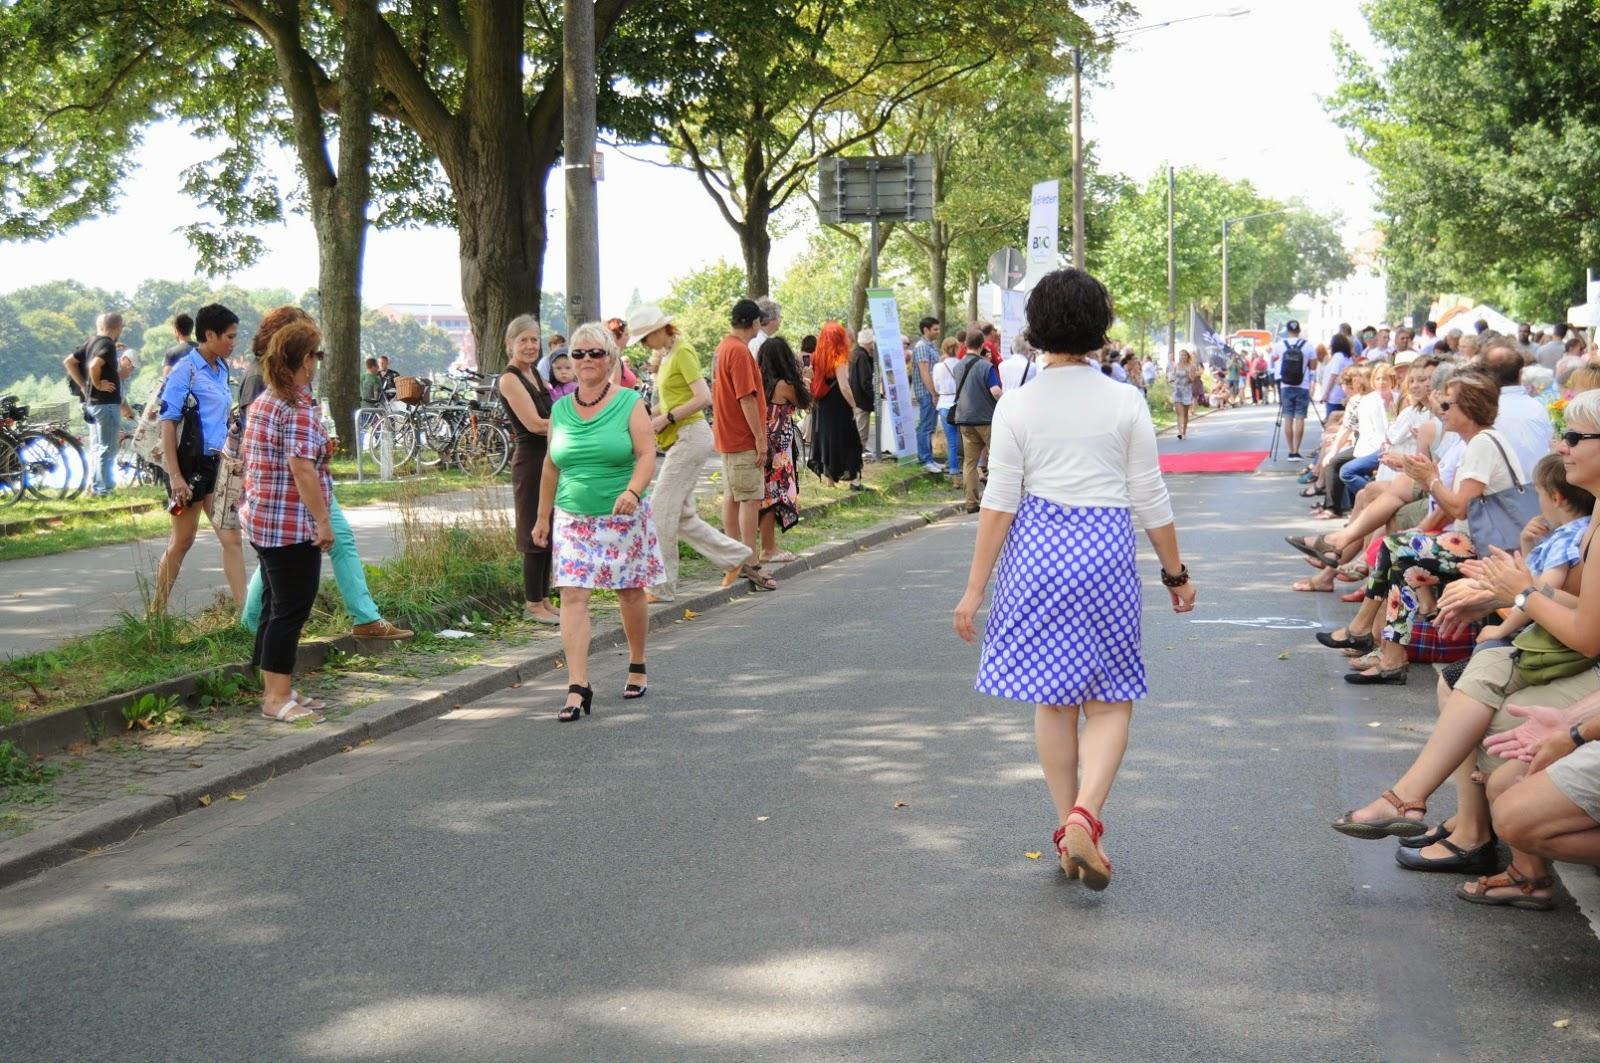 Modenschau (Fashion Show) by La Pasarela, Breminale 2014